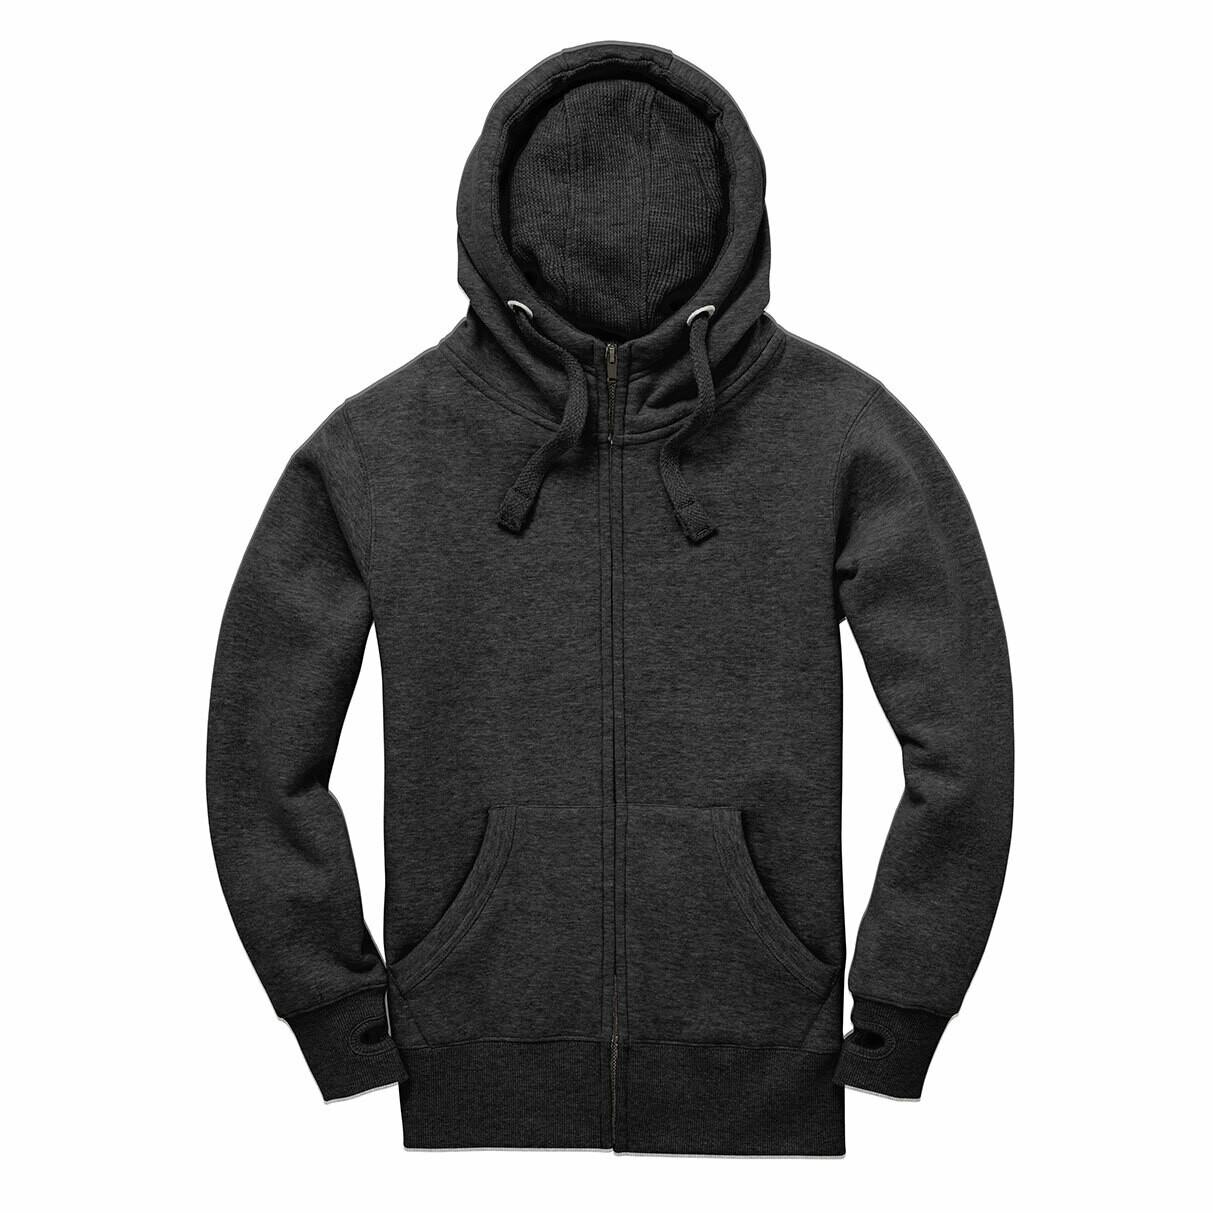 Ultra Peach Finish Zip hoodie